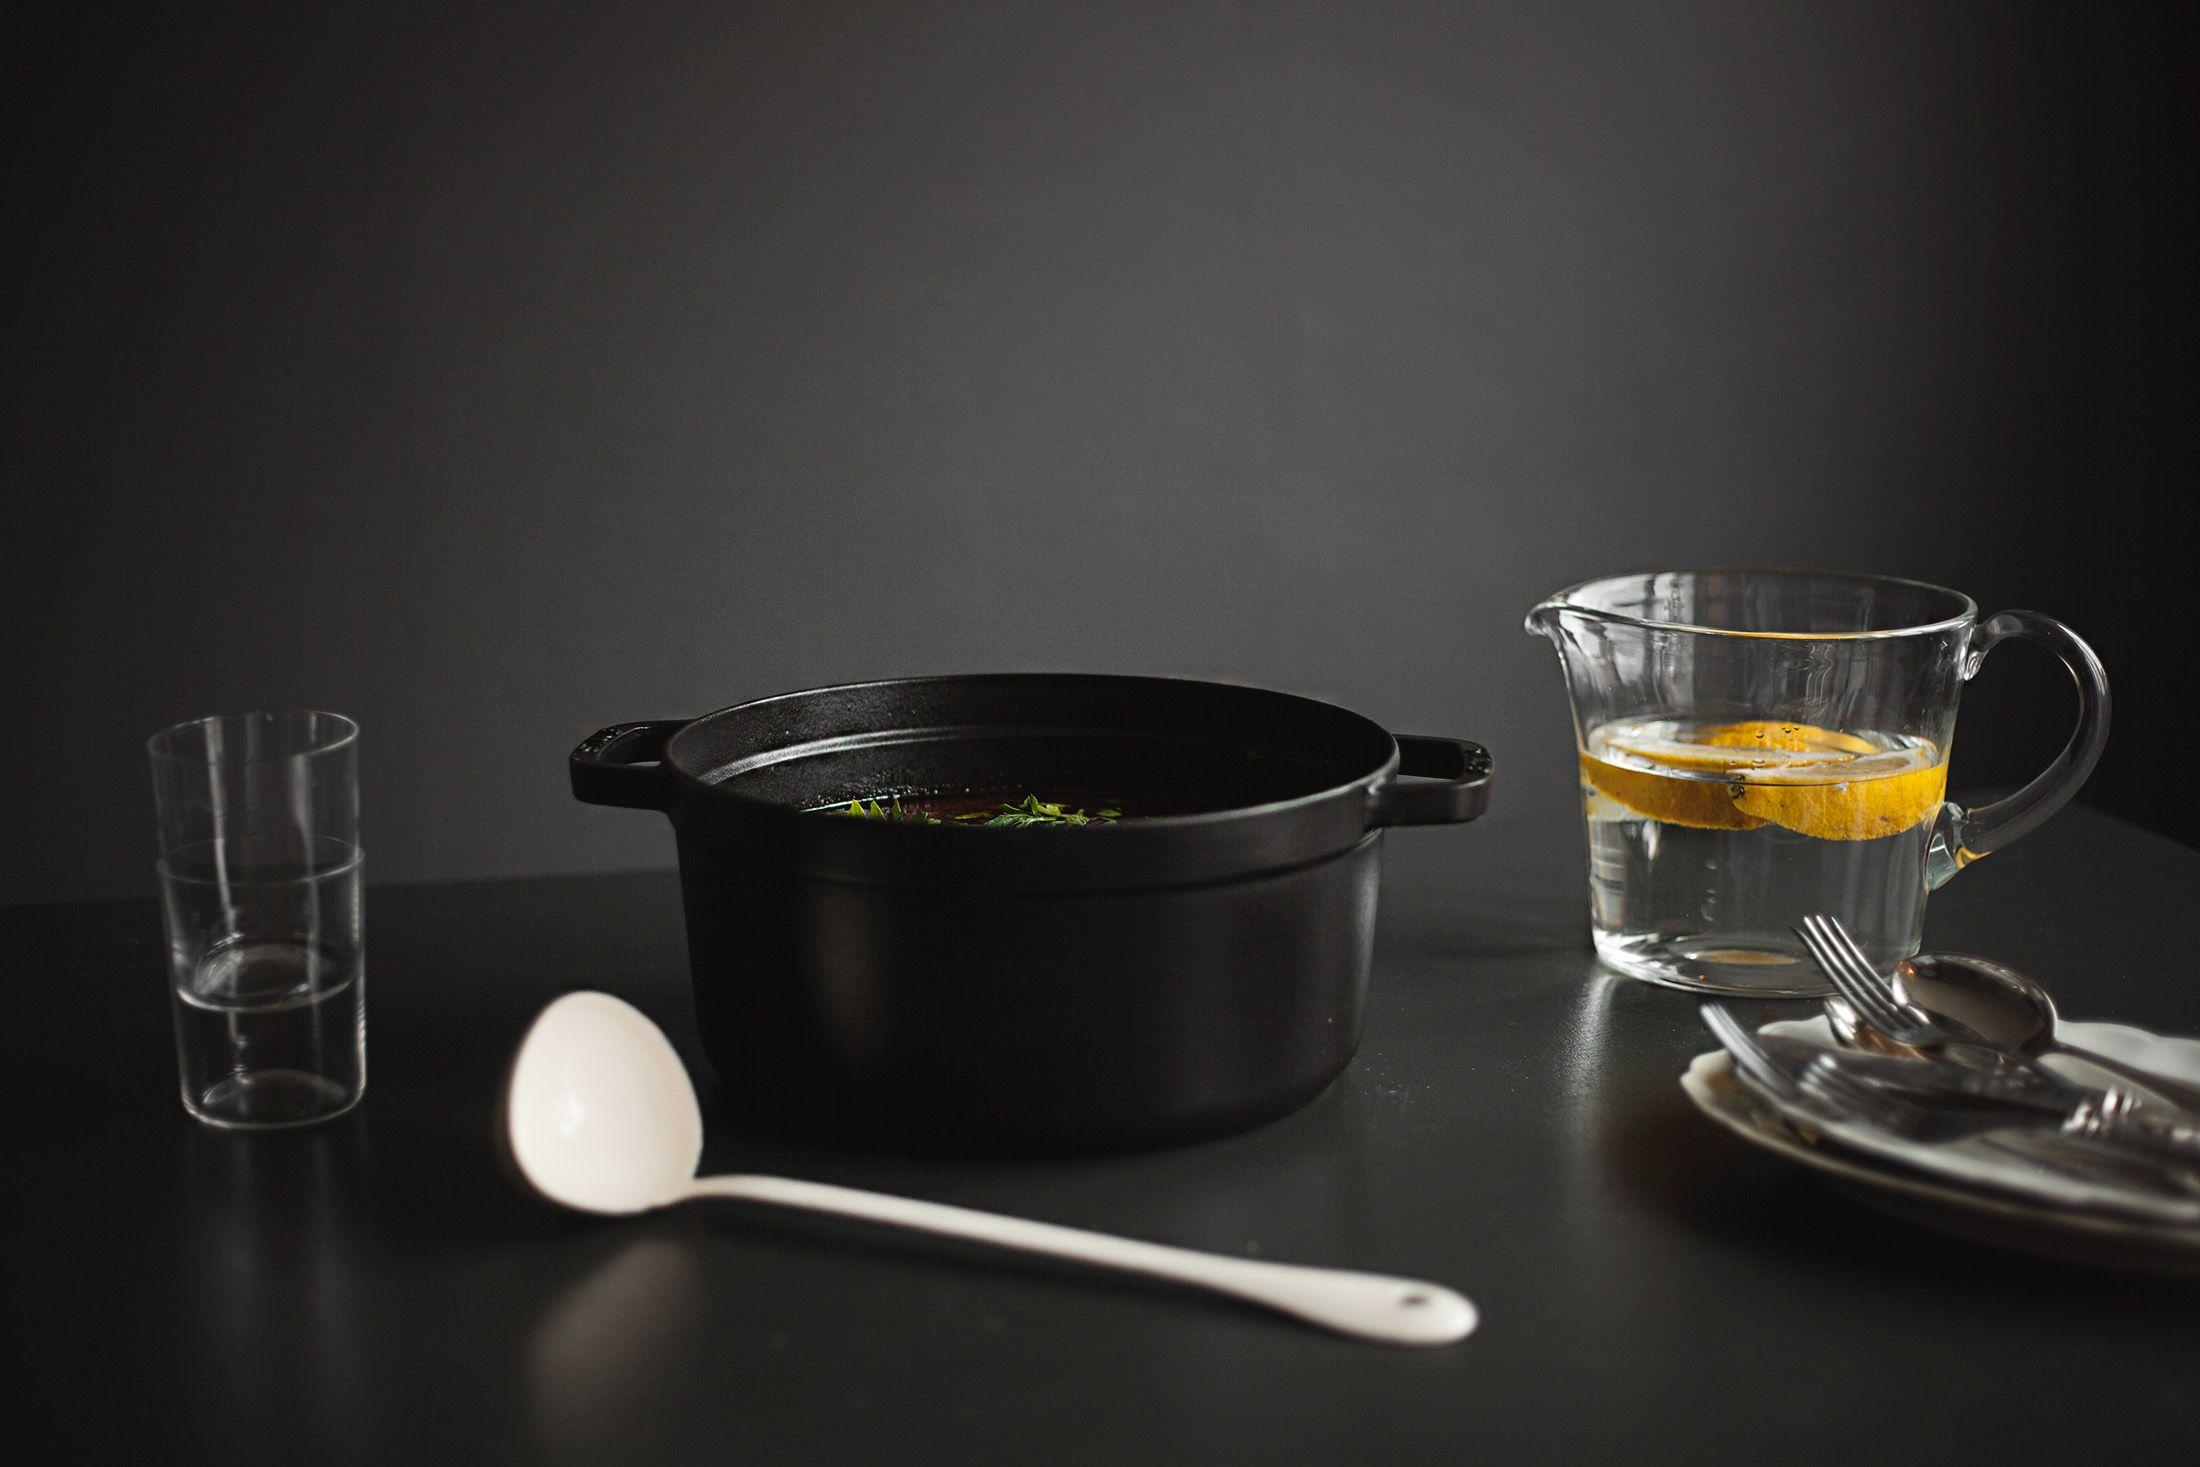 Gryta 5,2 Liter  #staub #cocotte #gryta #chili